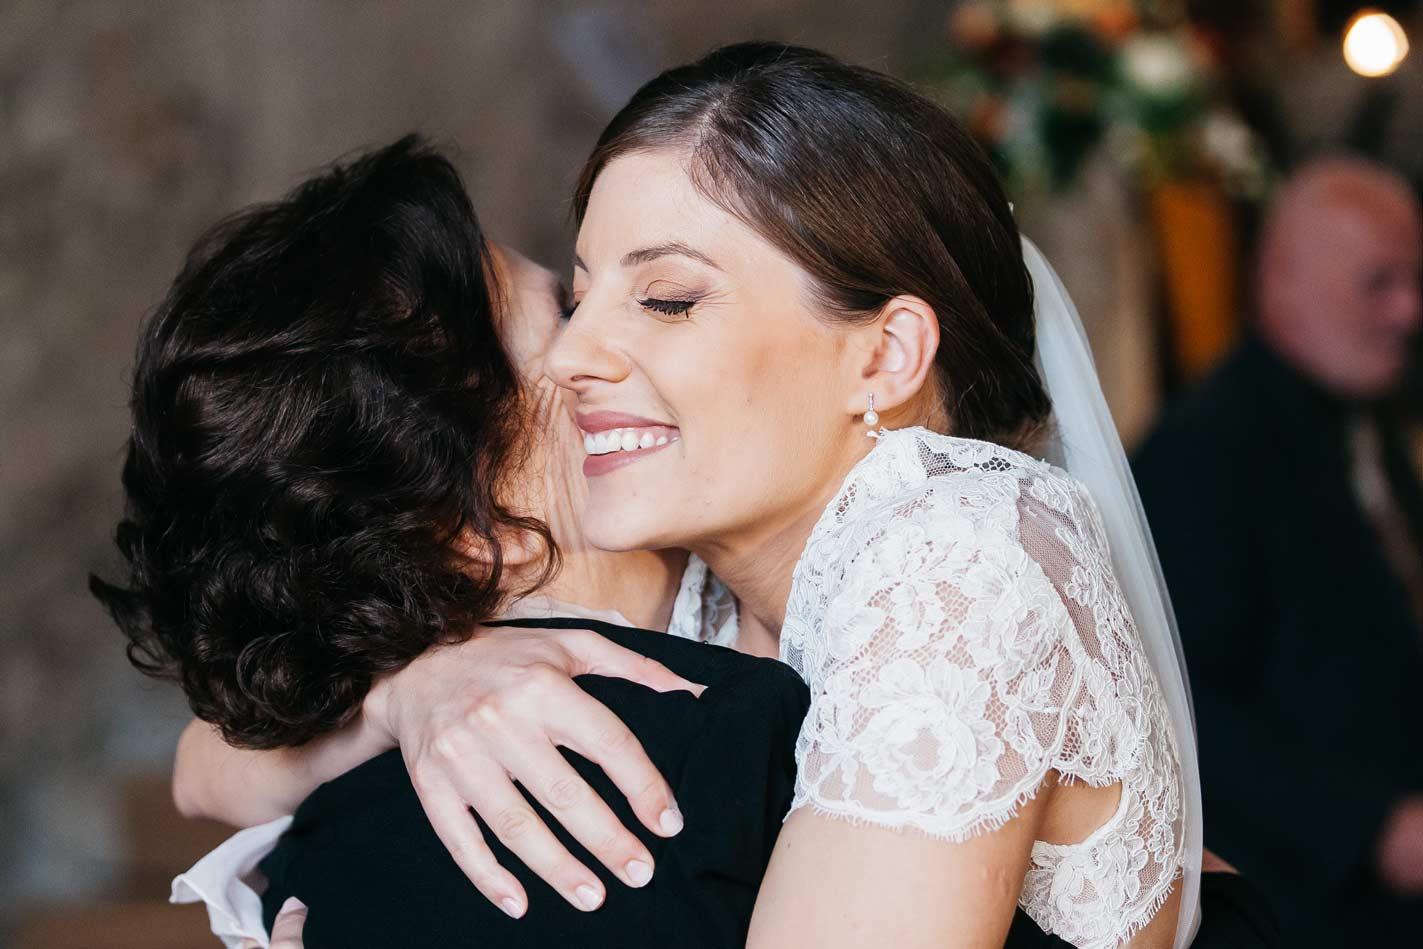 Reportage-Wedding-Photography-Documentary-Wedding-Photography-Ceremony